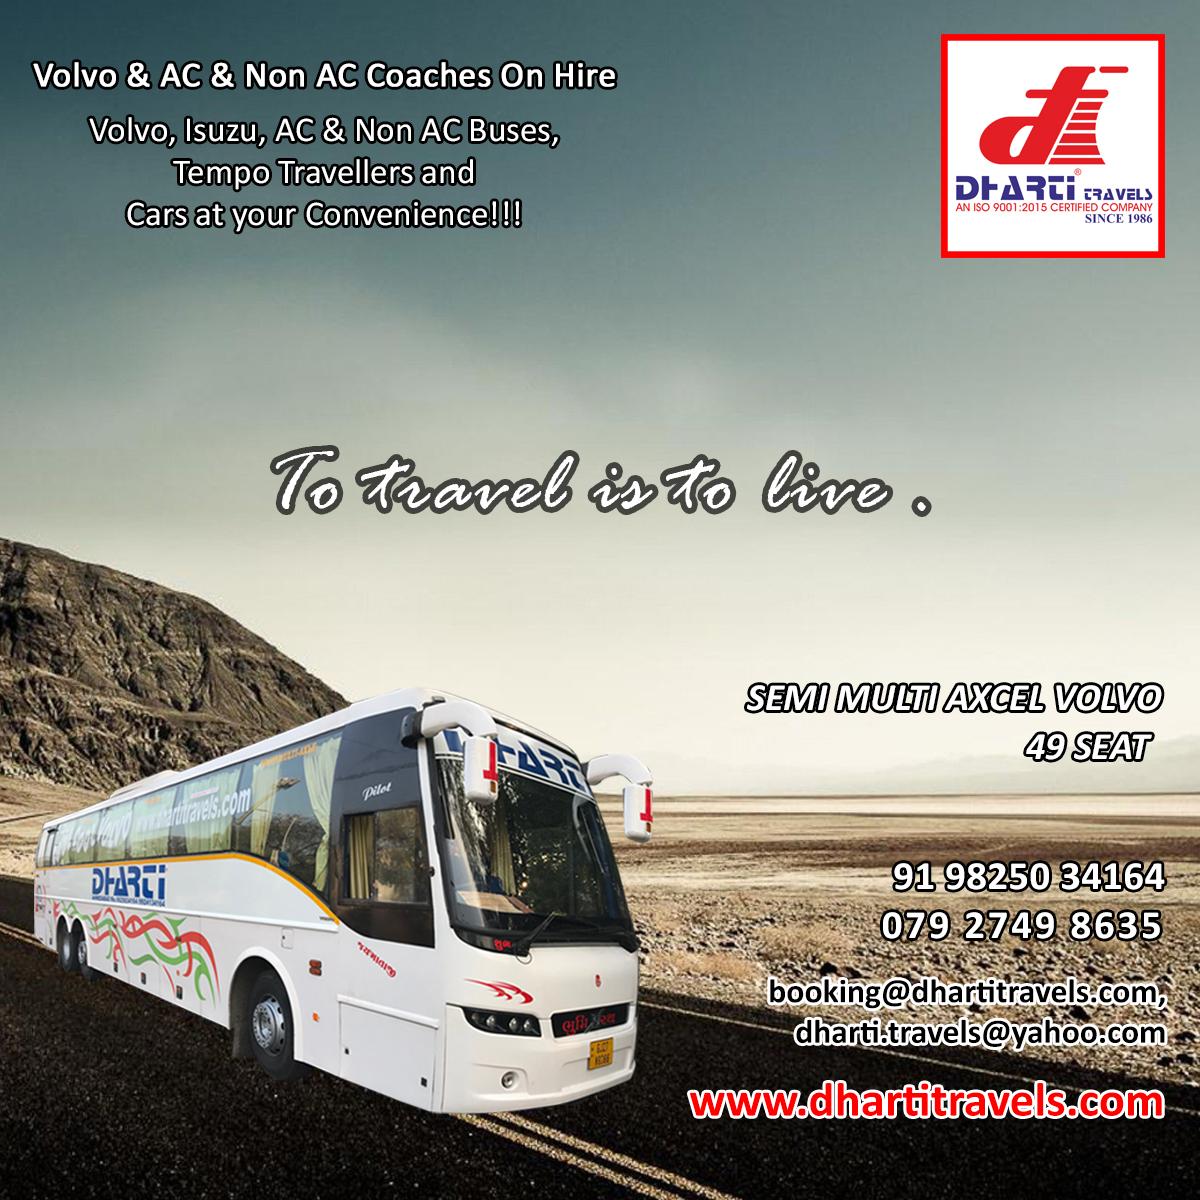 #DhartiTravels #LuxuryBus #BusRentalService #HireBus #HireVolvoBus #VehicleHire #rent #Hire #Pickup #VehicleHire #Volvo #Minibus #isuzu #acbus #ahmedabad #gujarat #india  Phone: 079 2749 8635 Mobile No.: + 91 98250 34164 Email:dharti.travels@yahoo.com Web: